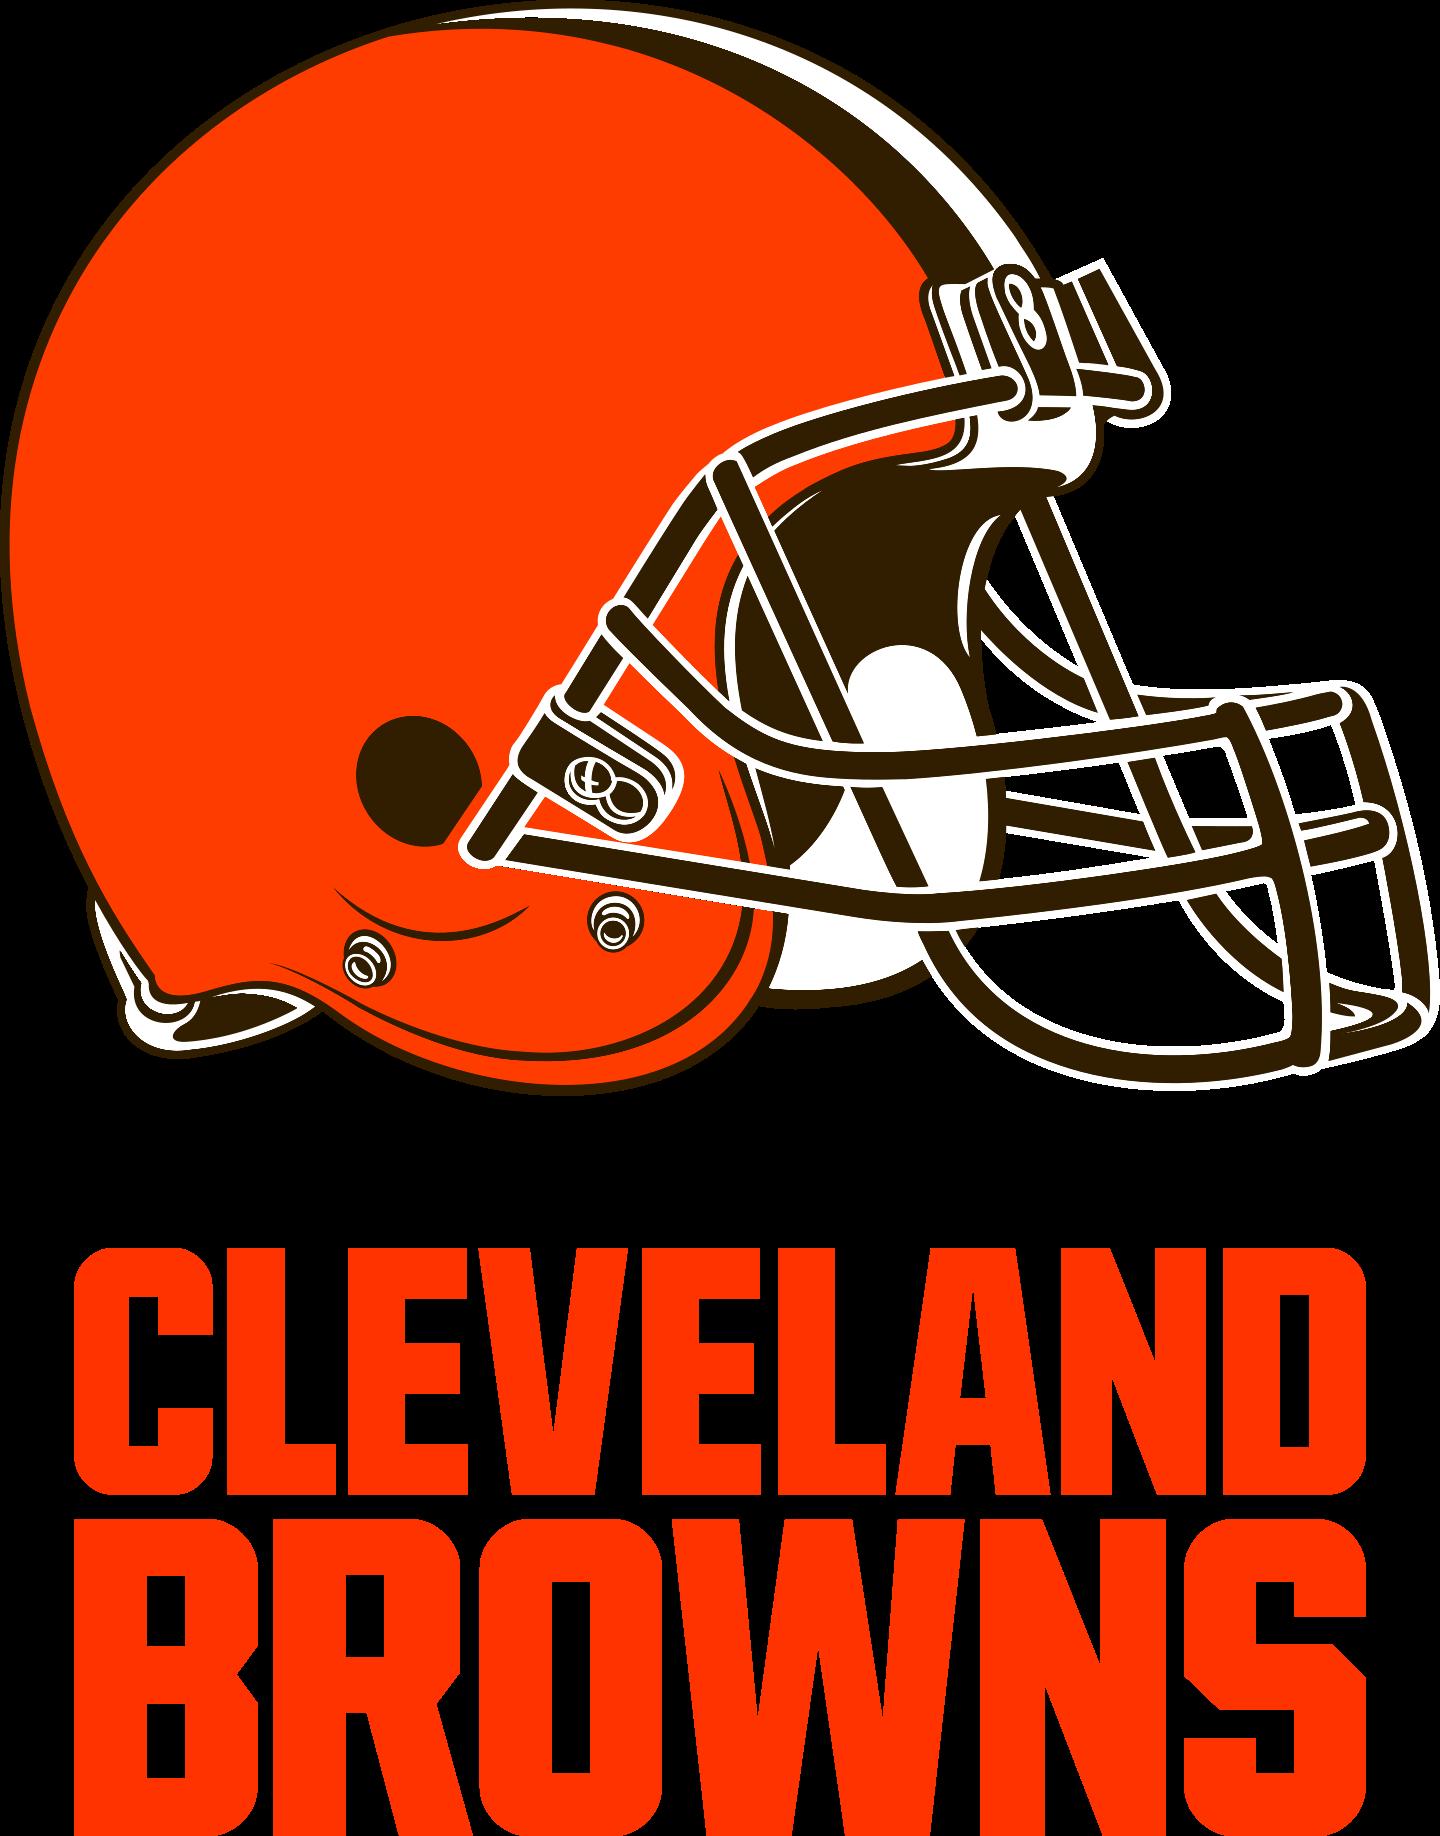 cleveland browns logo 3 - Cleveland Browns Logo